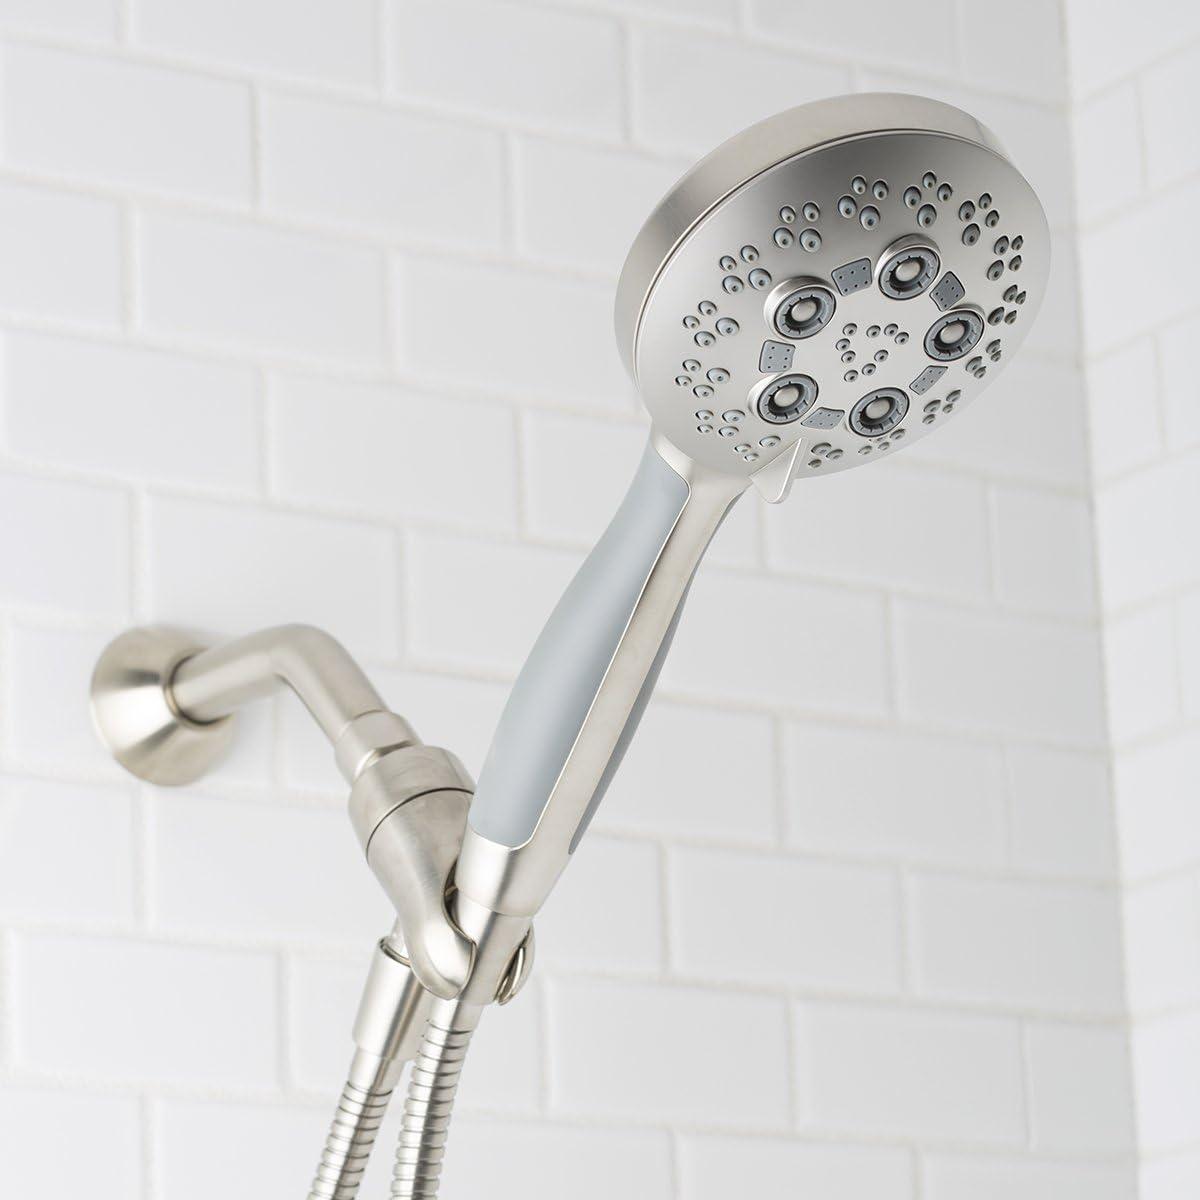 Brushed Ni Speakman VS-1240-BN Rio Multi-Function Handheld Shower Head 2.5 GPM